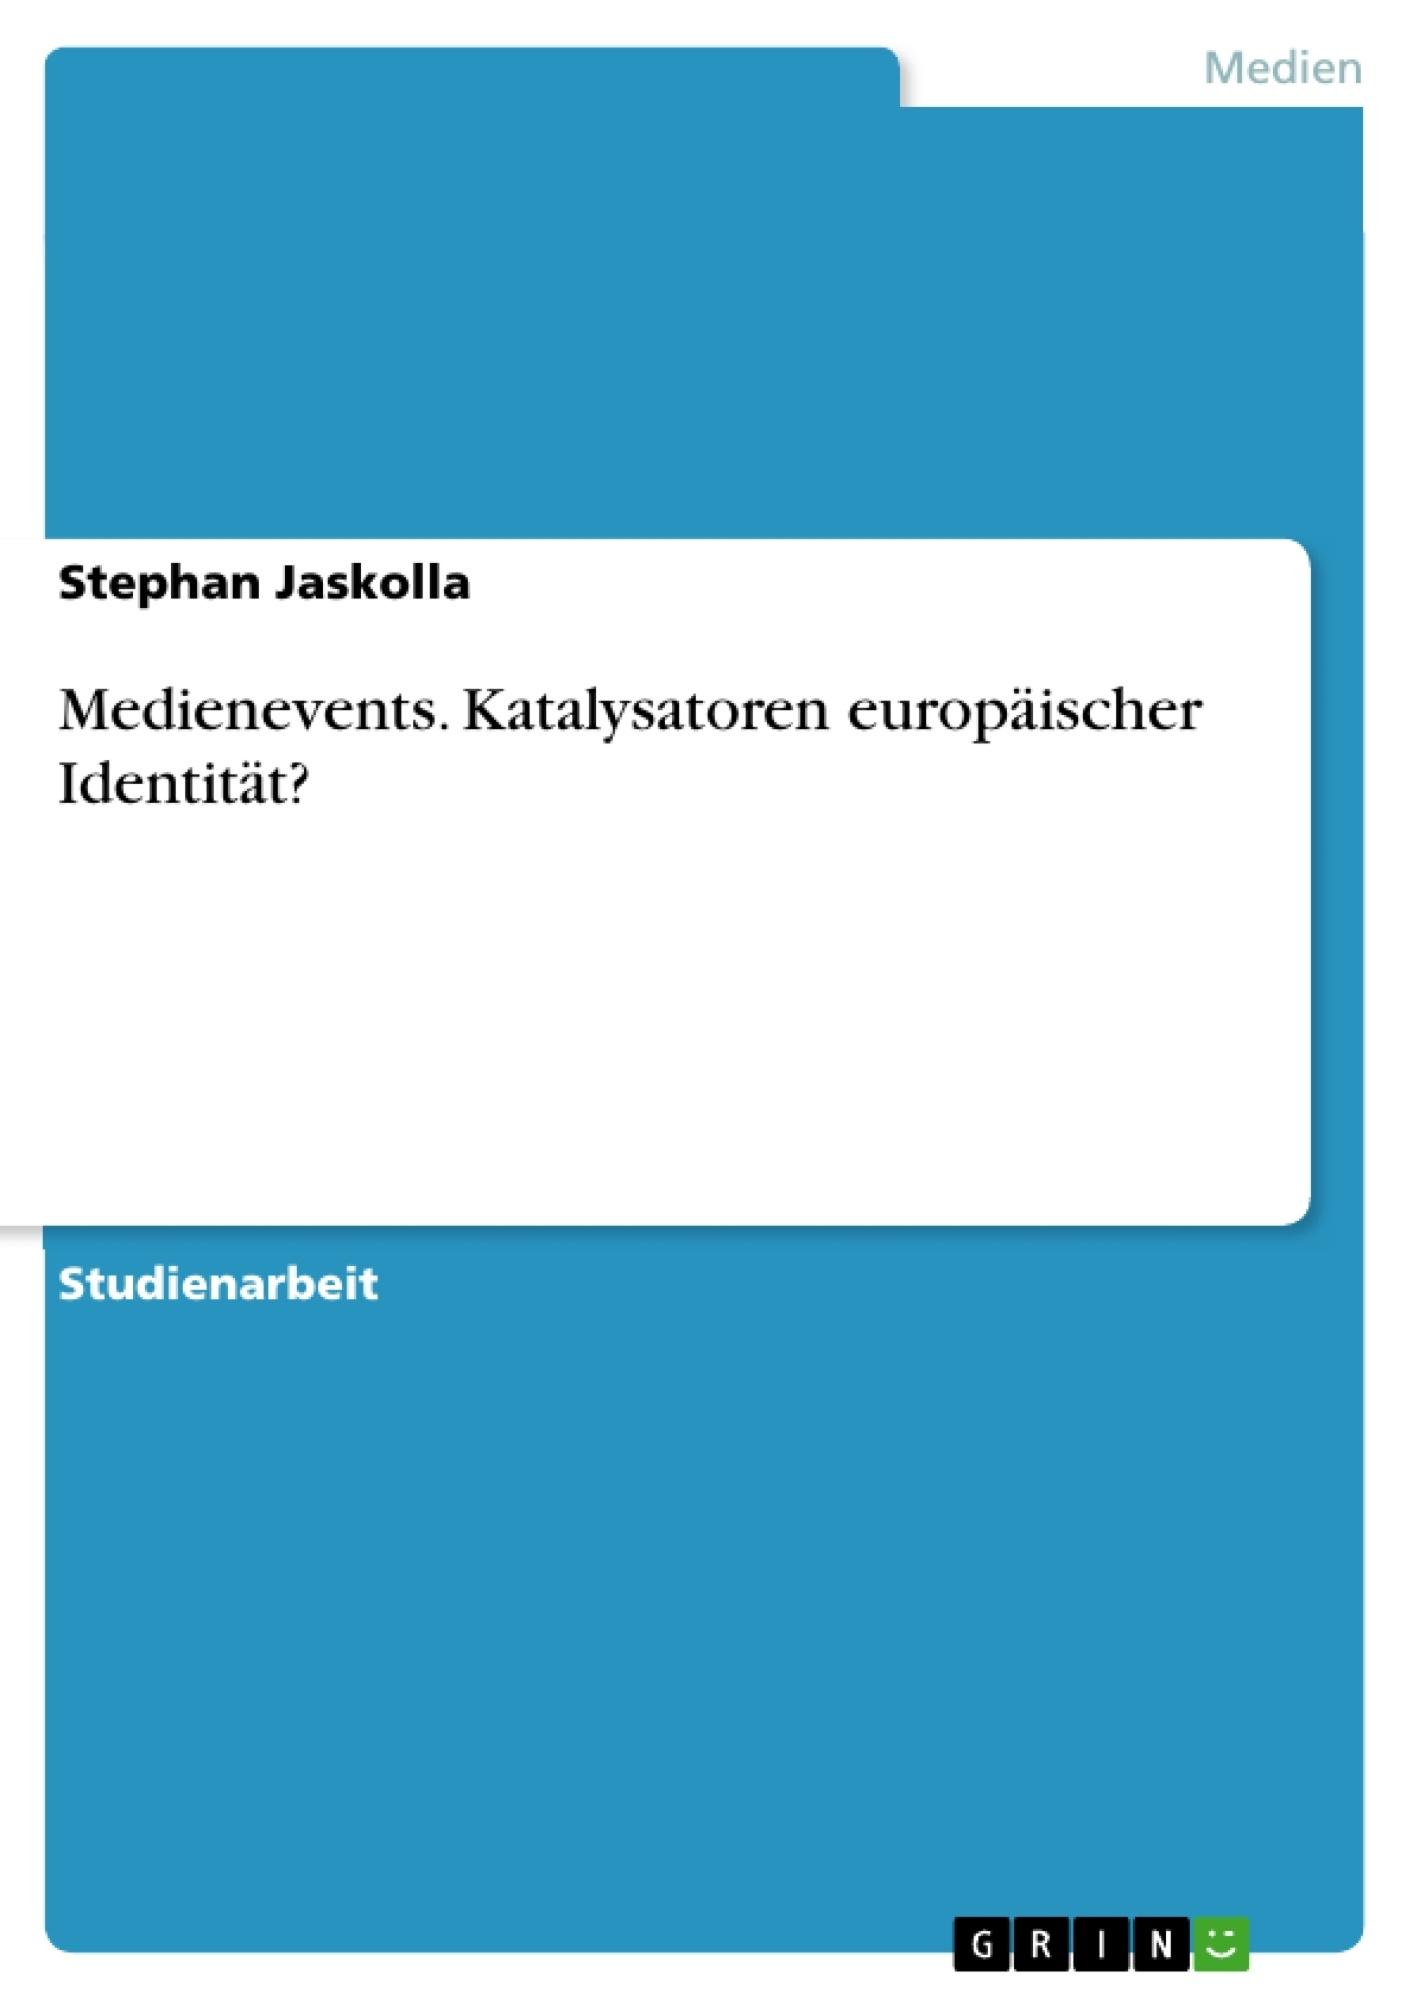 Titel: Medienevents. Katalysatoren europäischer Identität?